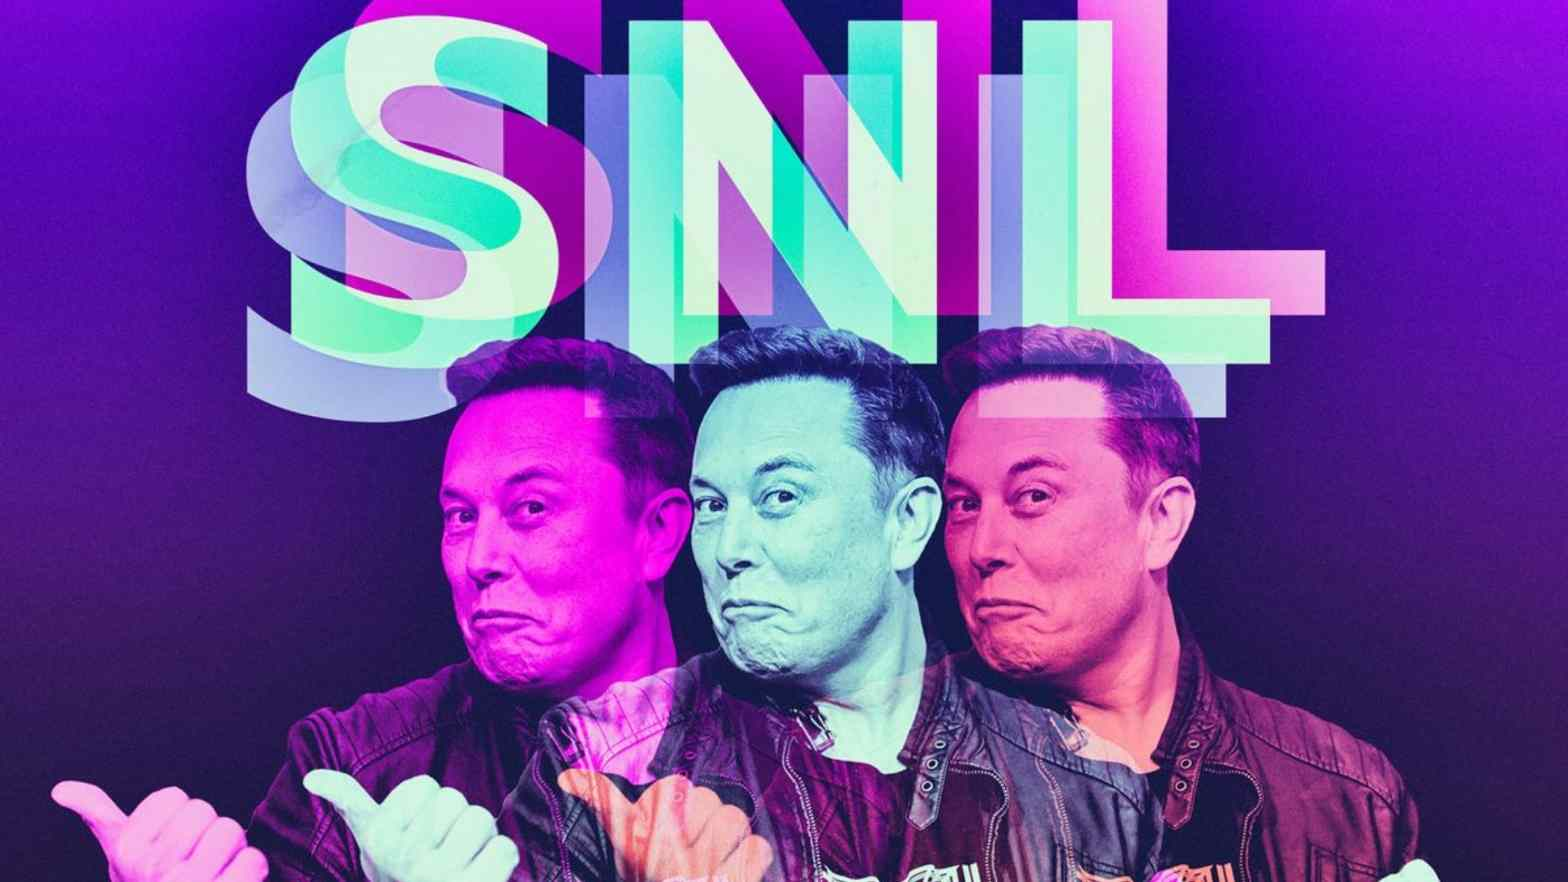 Automobile Companies Claim Elon Musk SNL is Anti Competitive Behavior